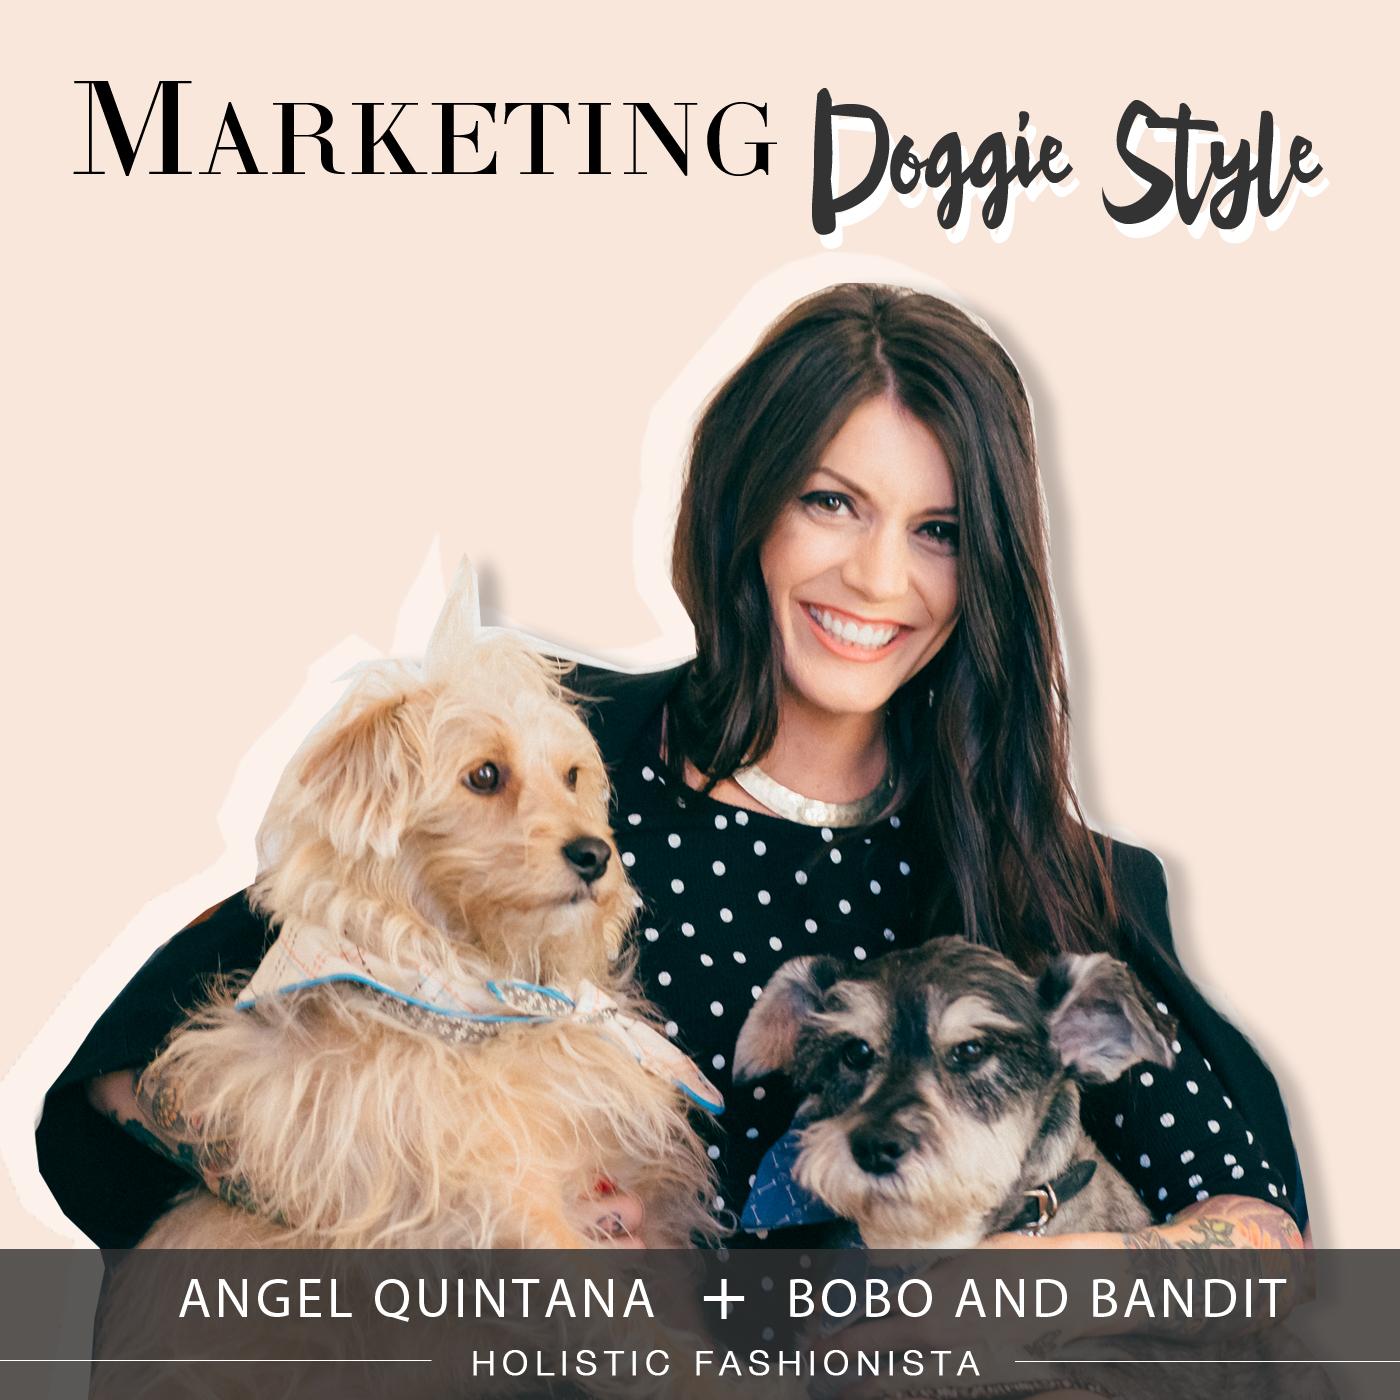 Marketing Doggie Style - Holistic Fashionista